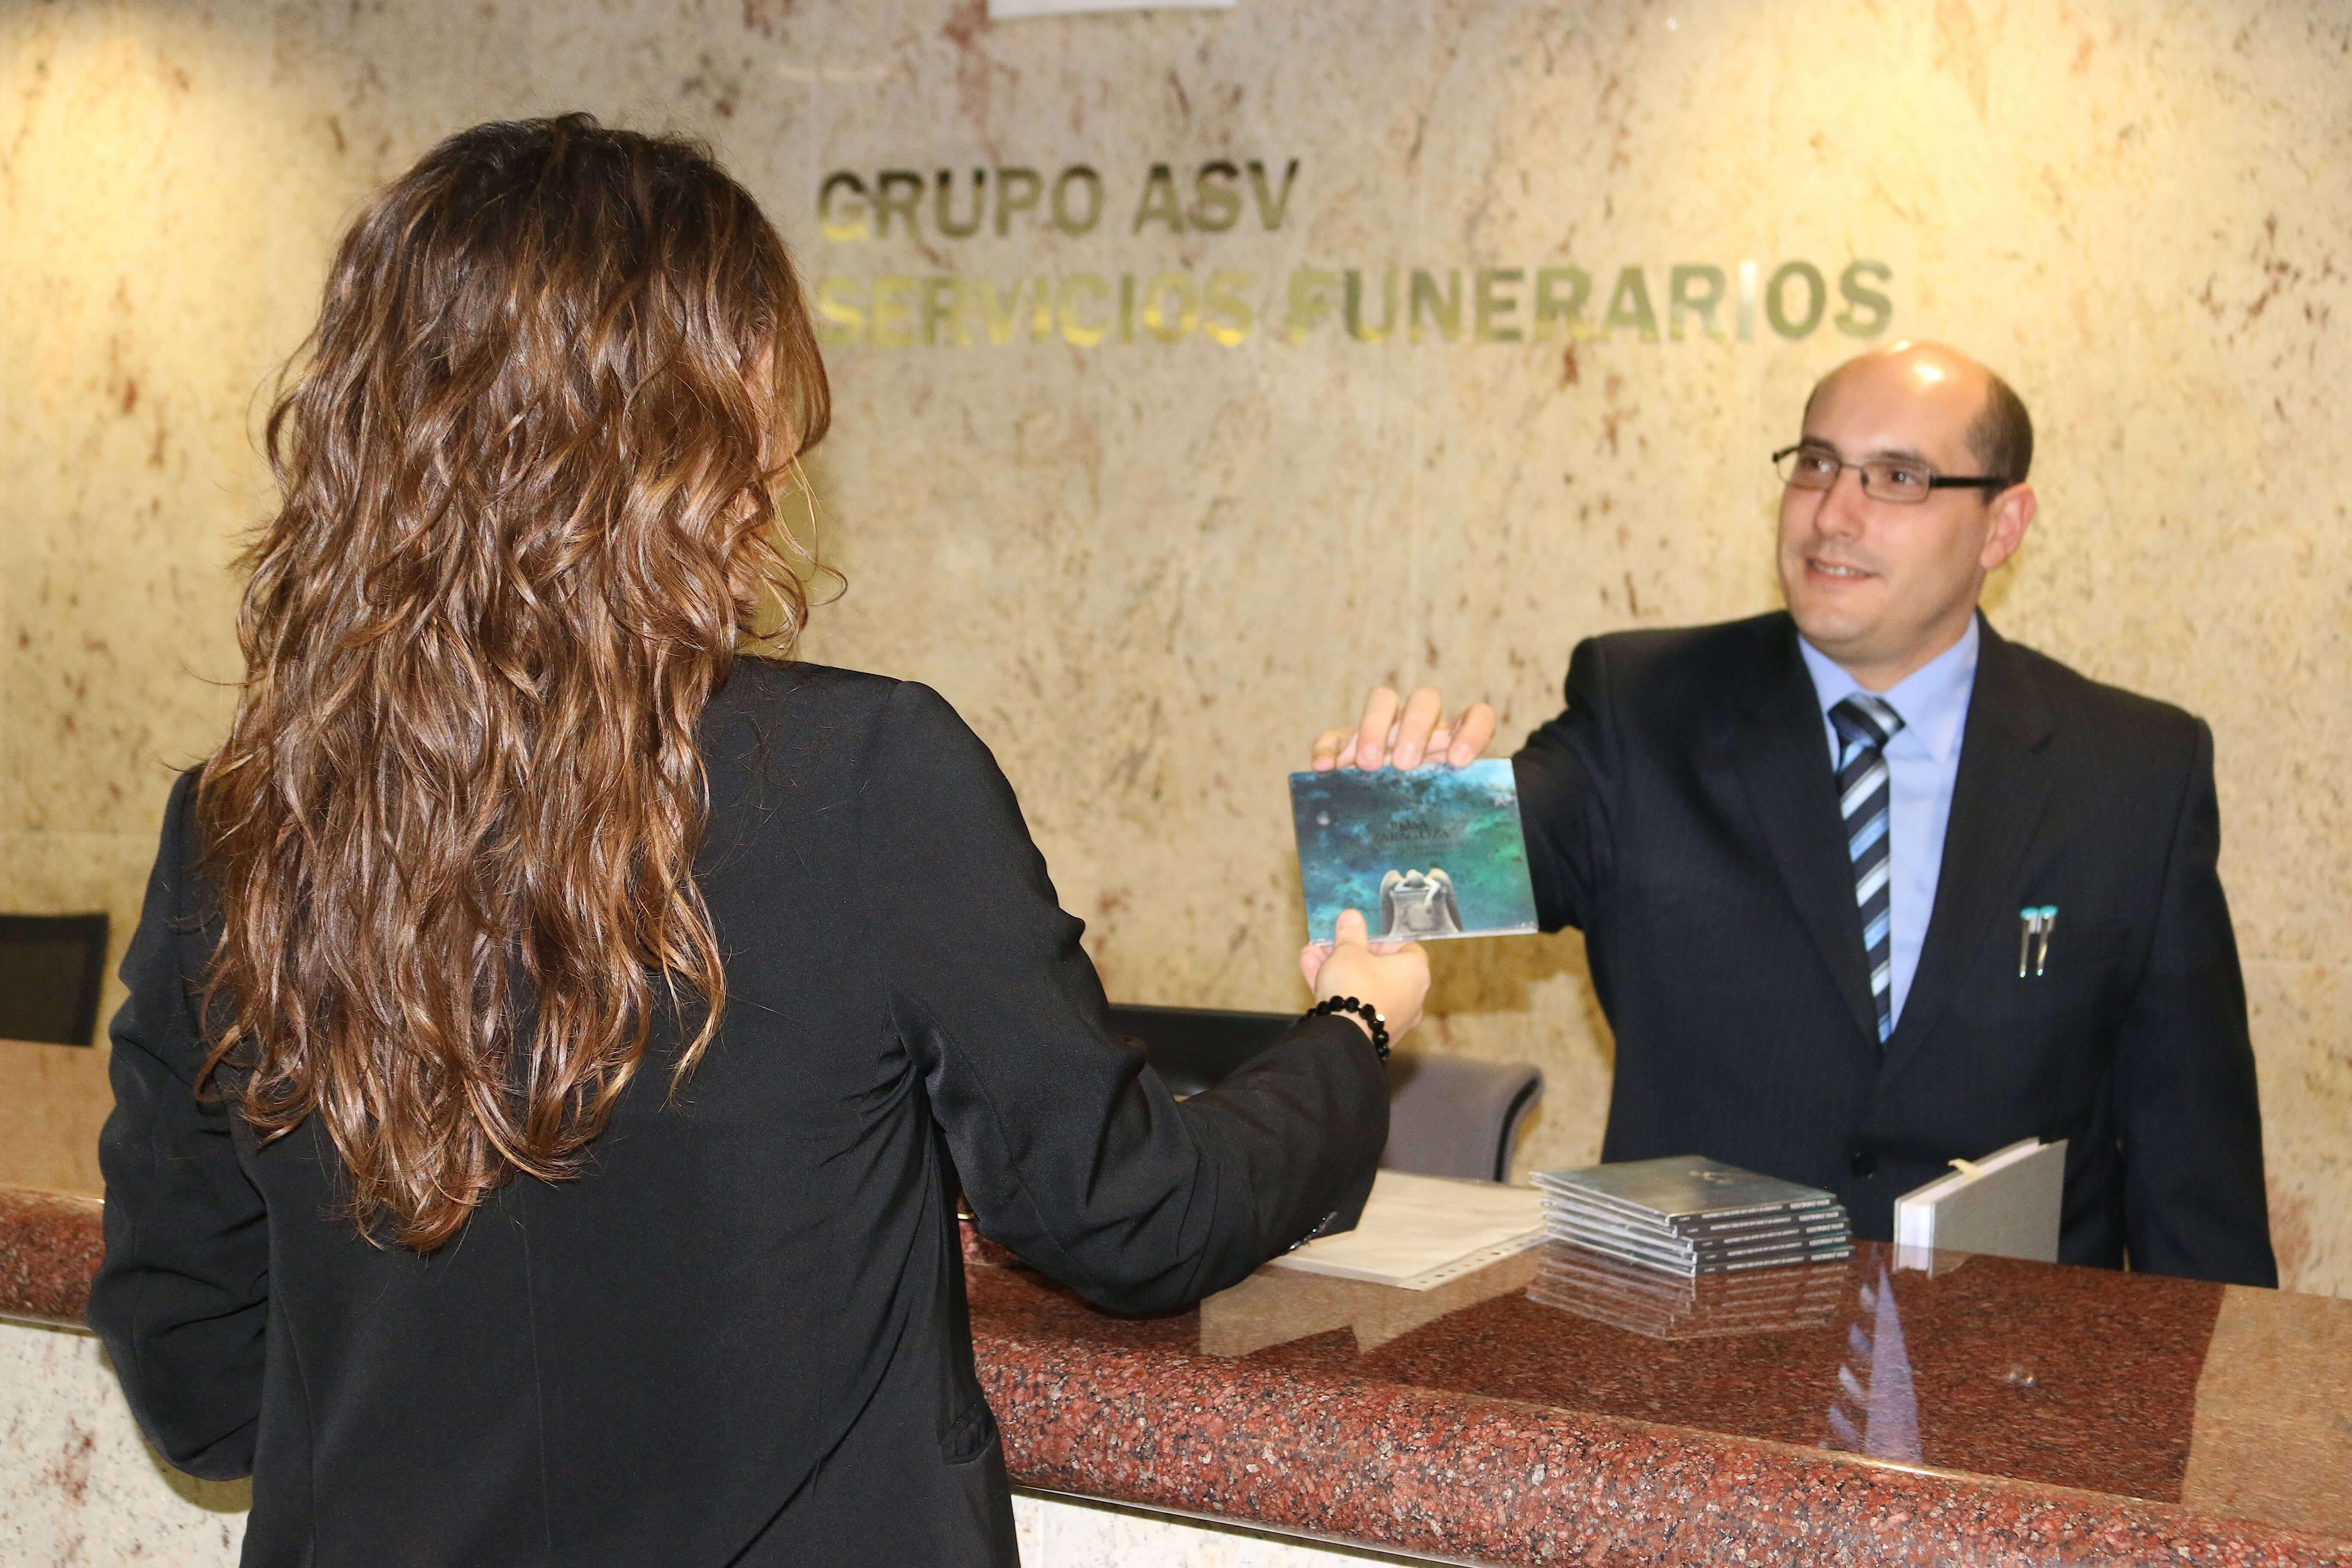 Customers of Grupo ASV Servicios Funerarios will receive a free CD